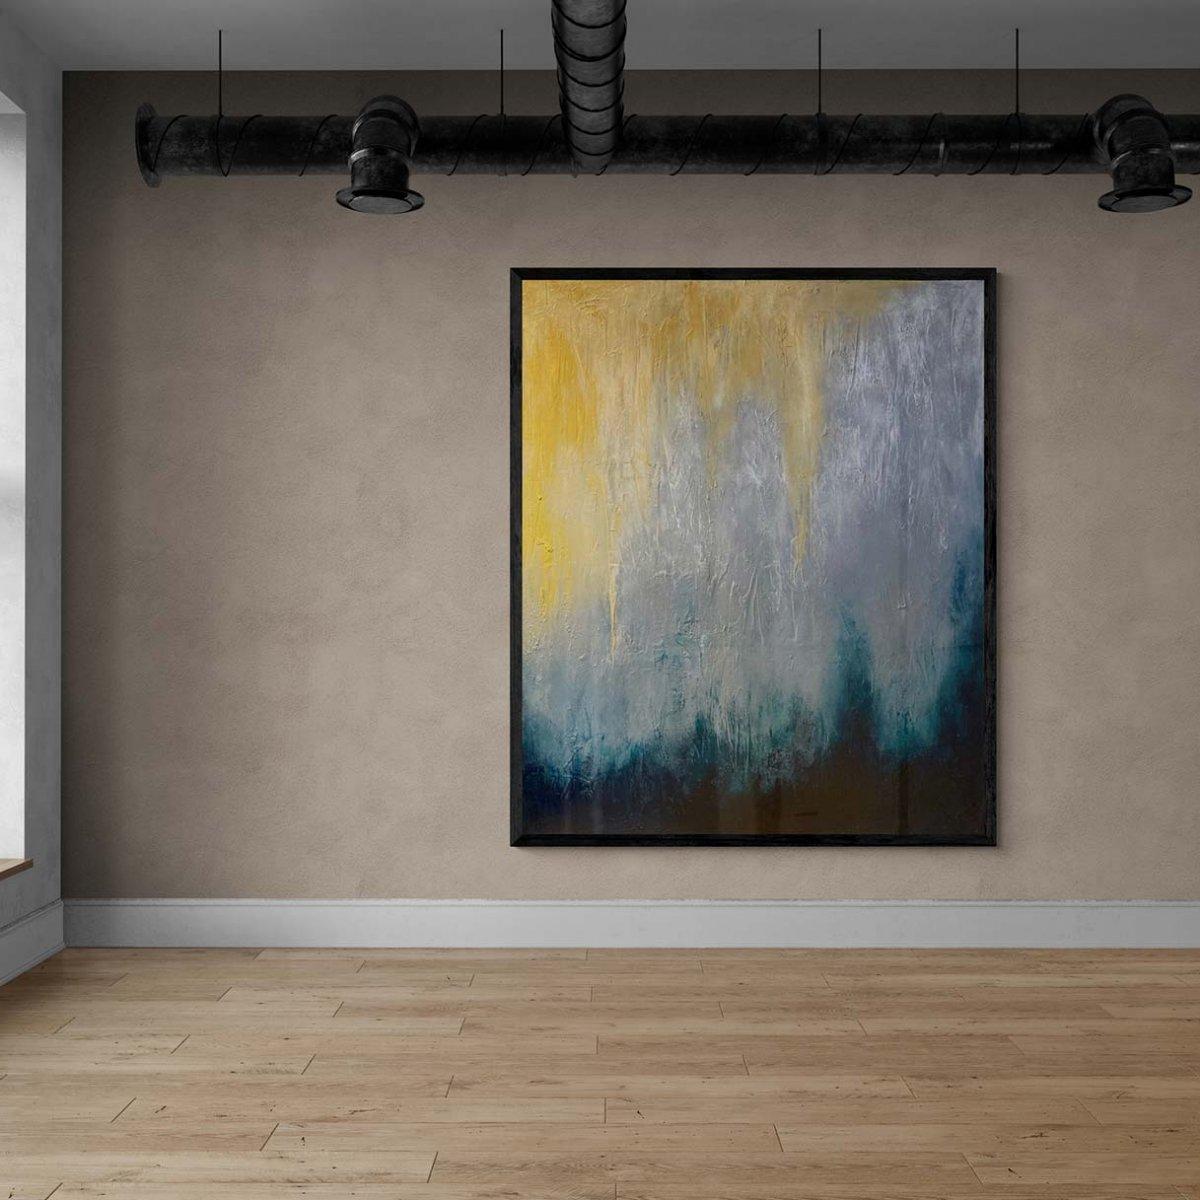 Large empty industrial studio gallery | AlessandraViola.co.uk